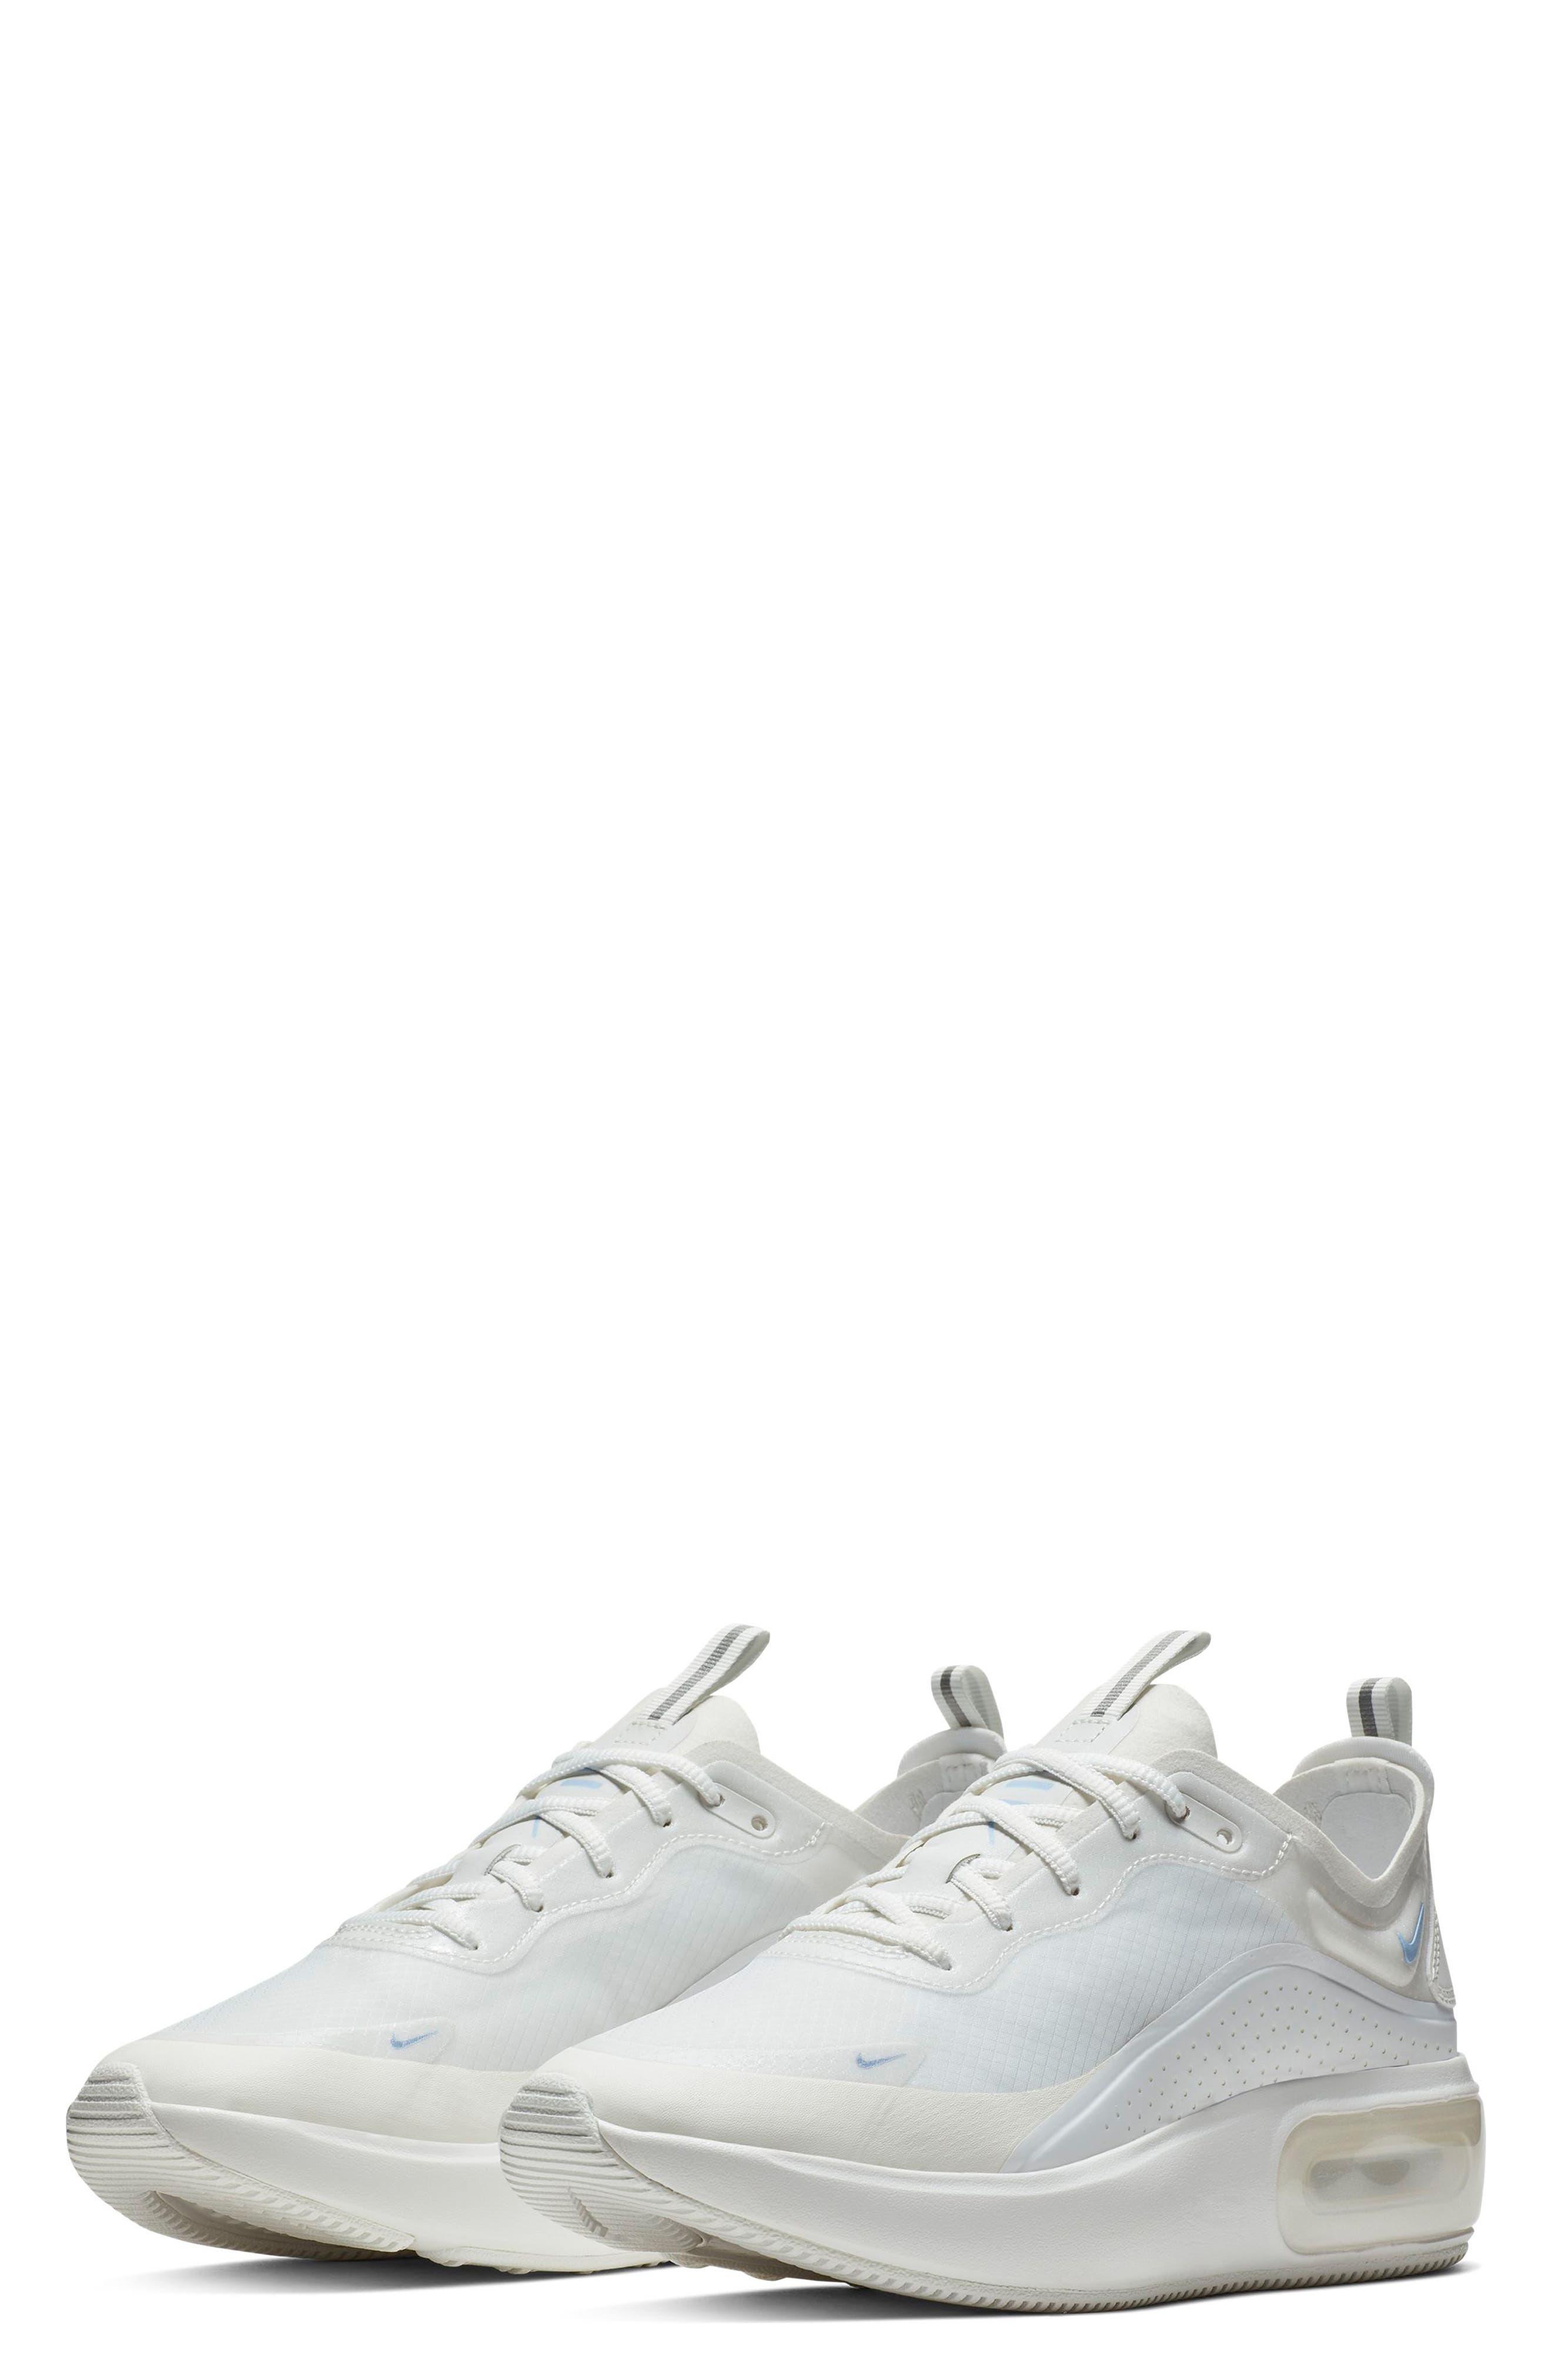 Air Max DIA SE Running Shoe,                             Main thumbnail 1, color,                             WHITE/ ALUMINUM/ WHITE